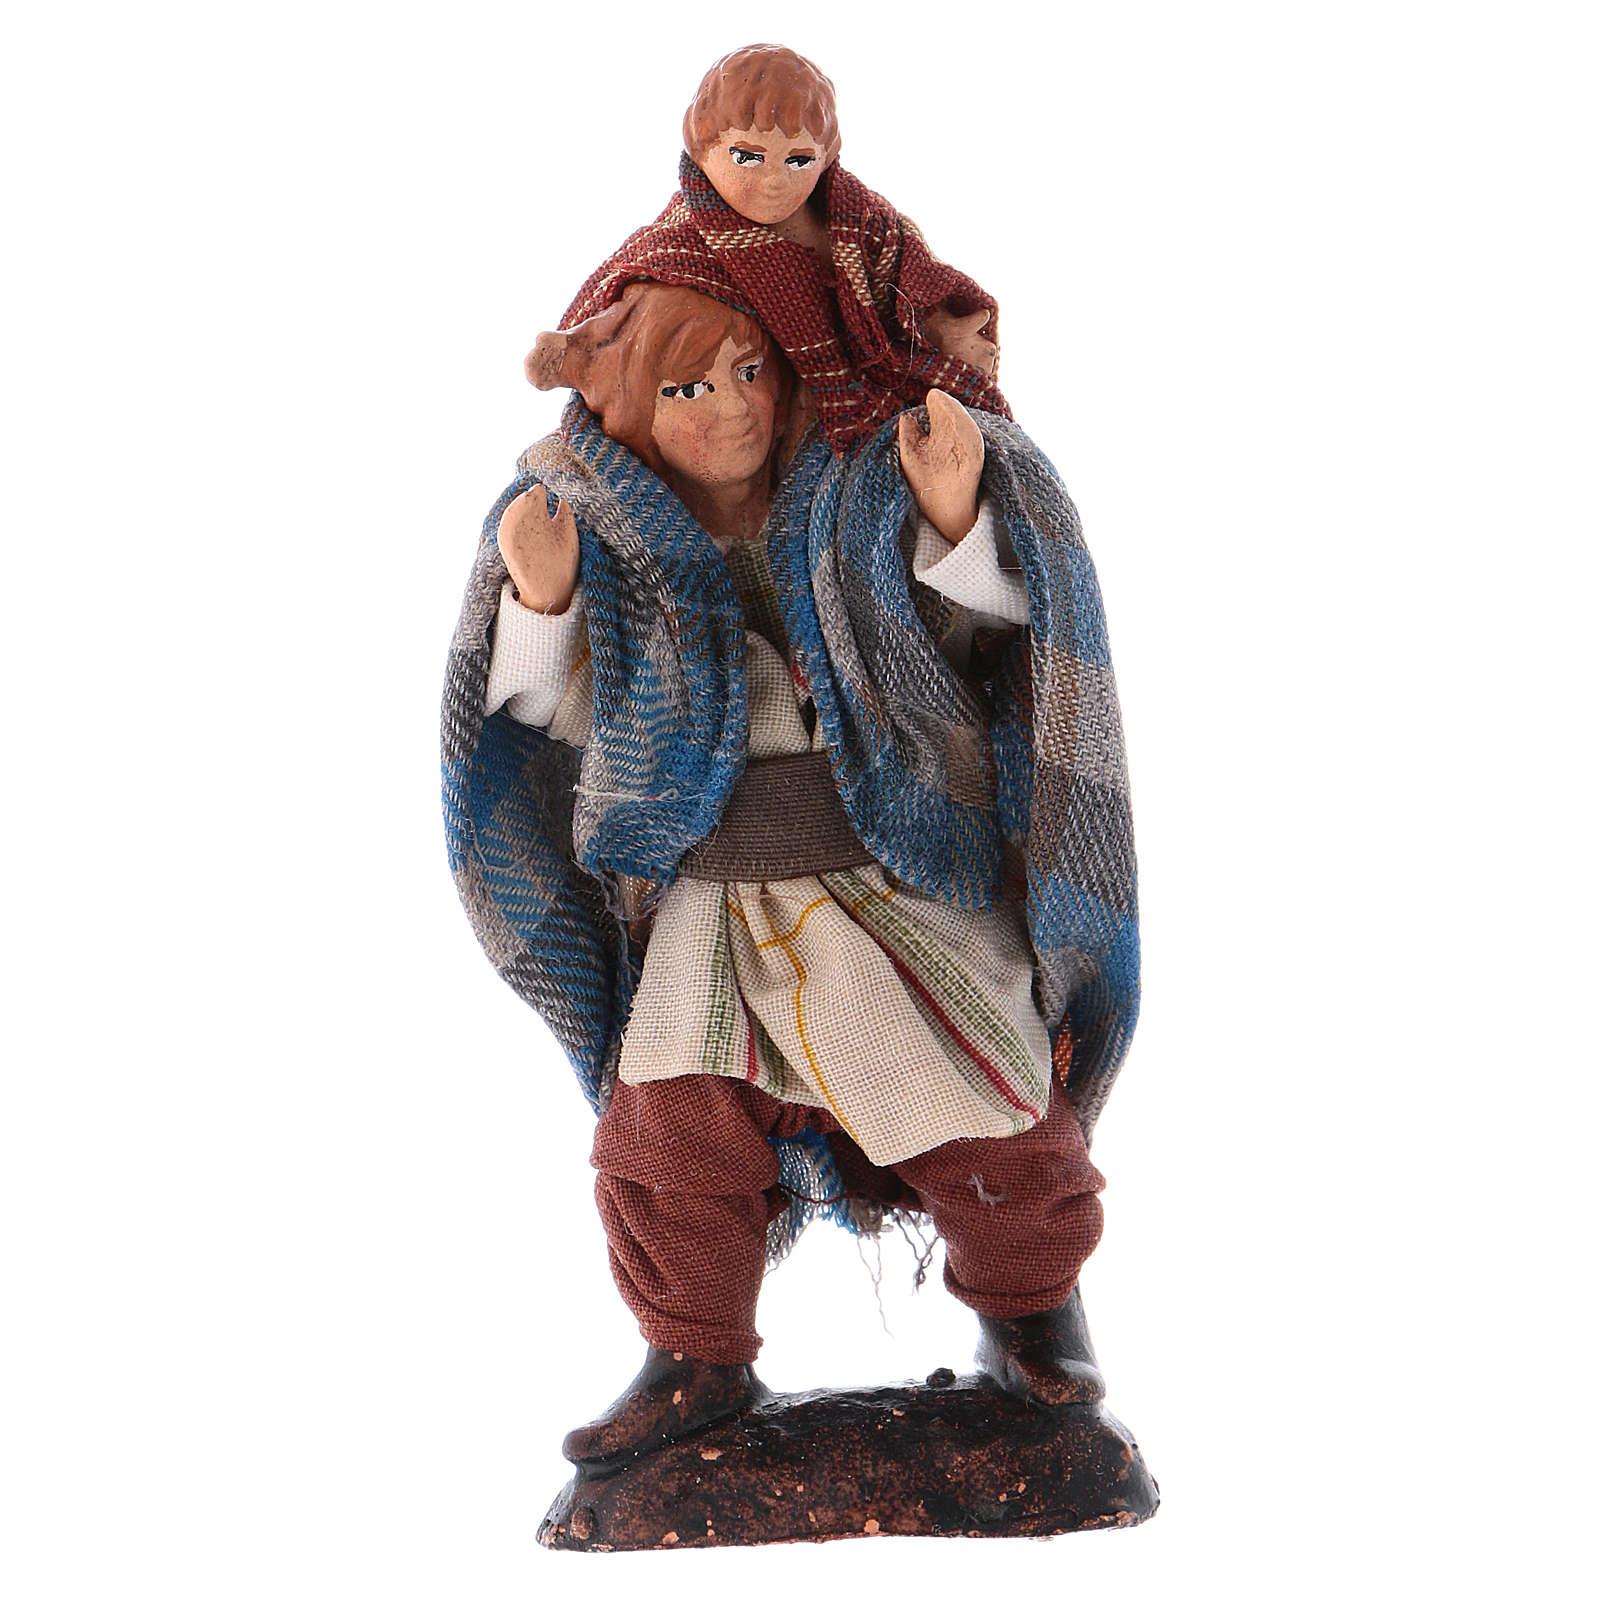 Neapolitan Nativity figurine, Man giving child a piggyback ride 4